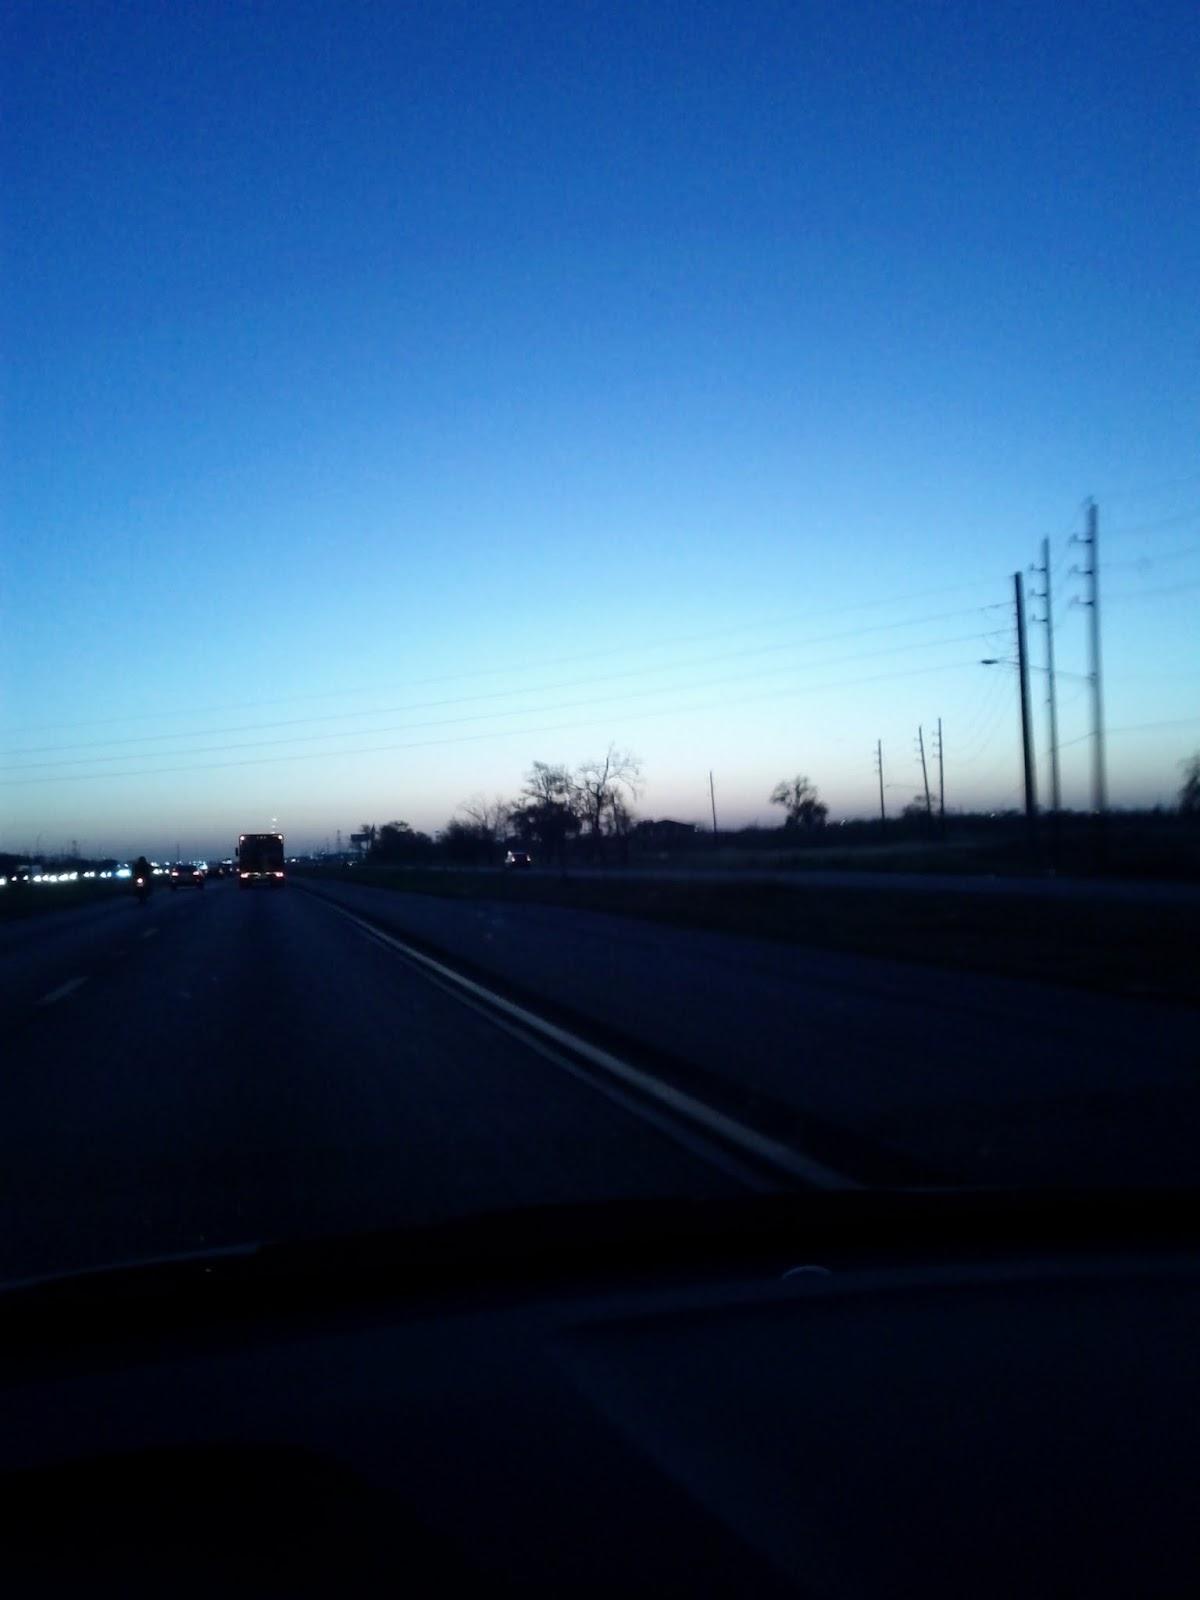 Sky - IMG_20130315_071822.jpg